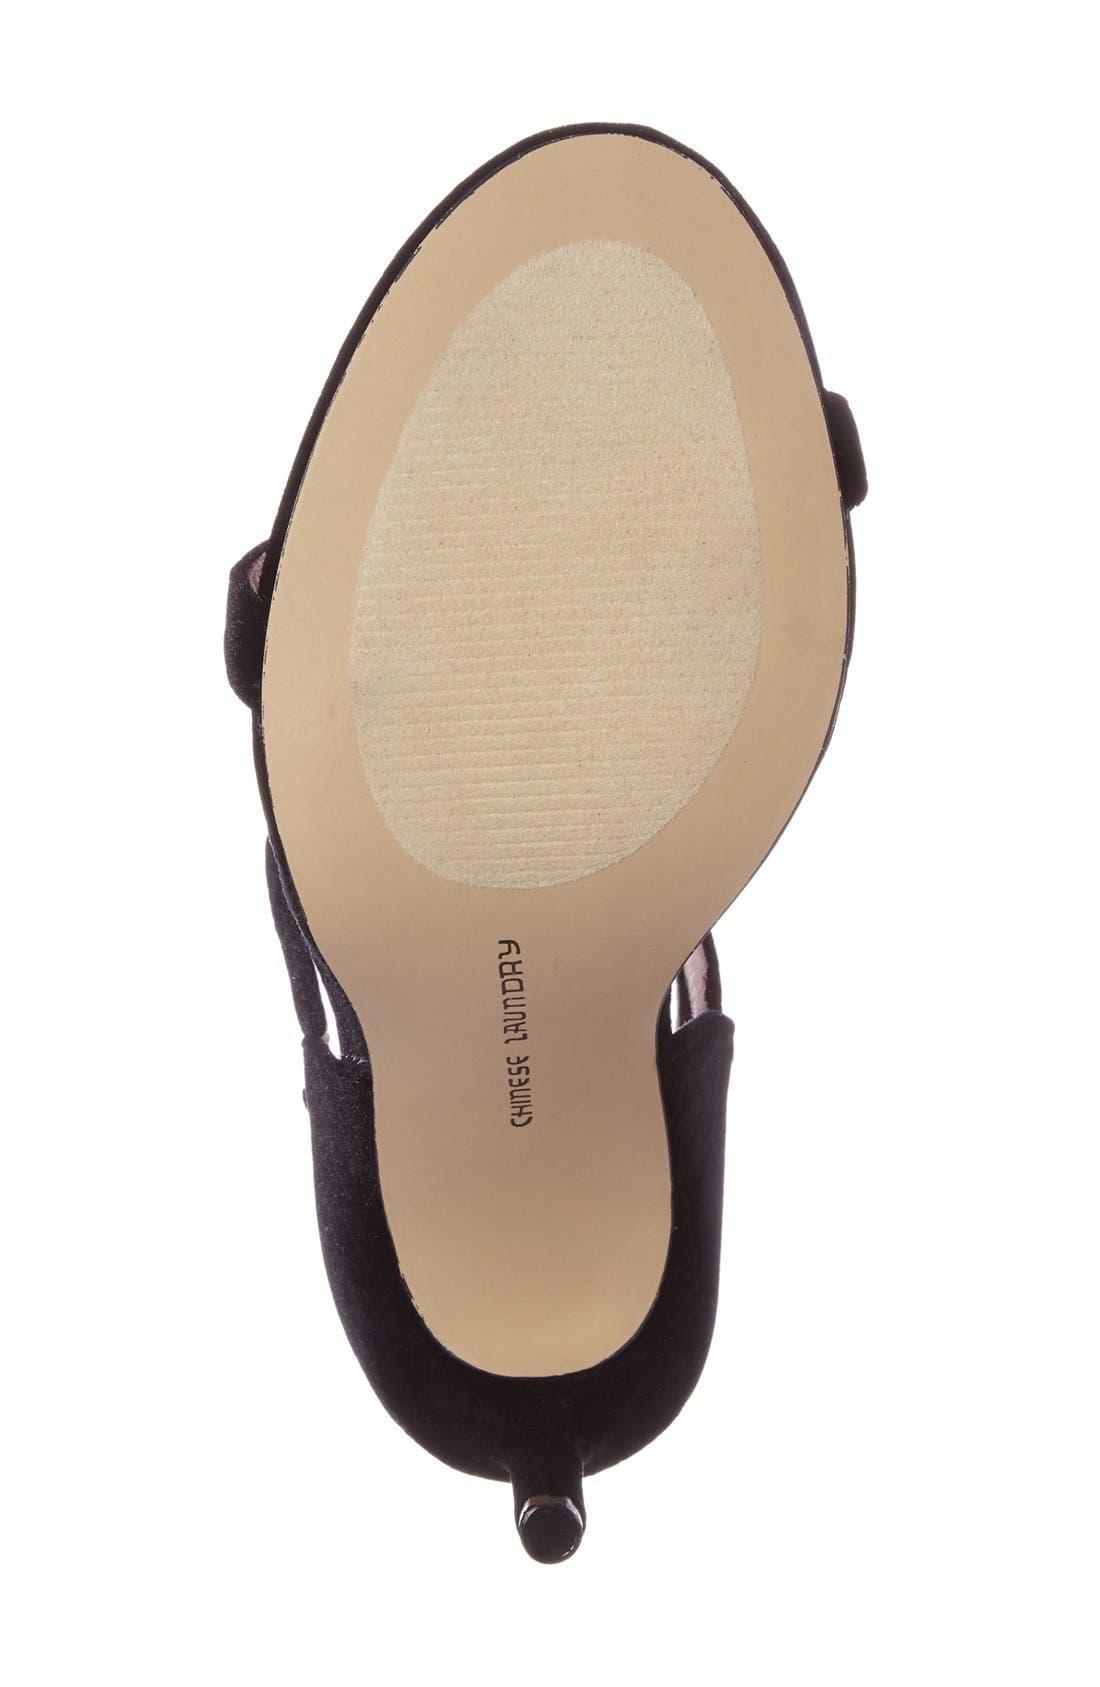 Lavelle Ankle Strap Sandal,                             Alternate thumbnail 8, color,                             001